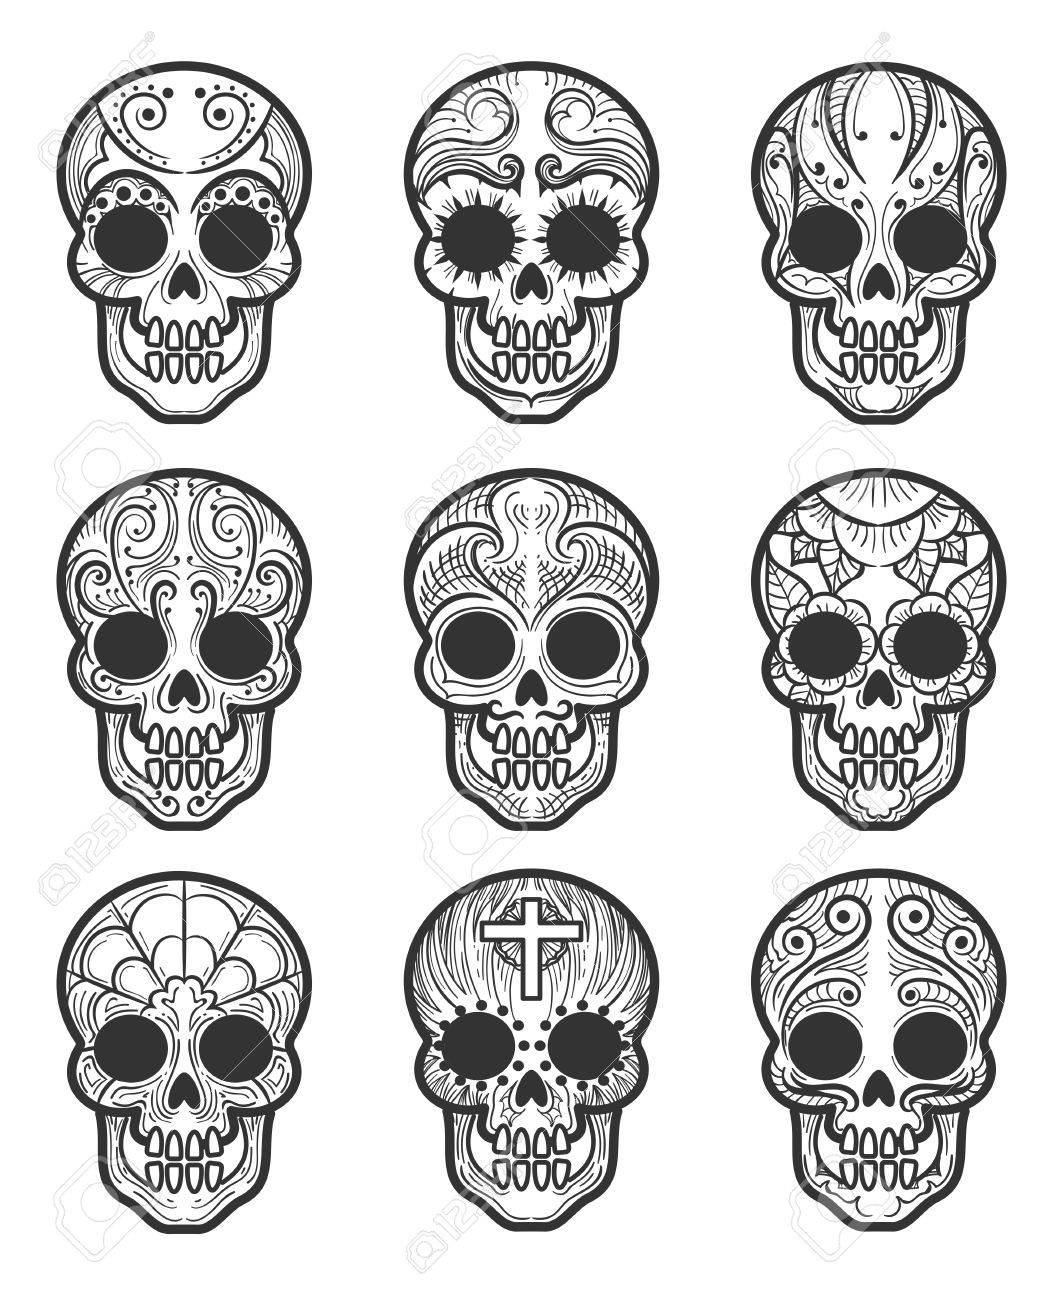 Calavera Tattoo Flash mexican day of the dead tattoo drawings - best tattoo ideas